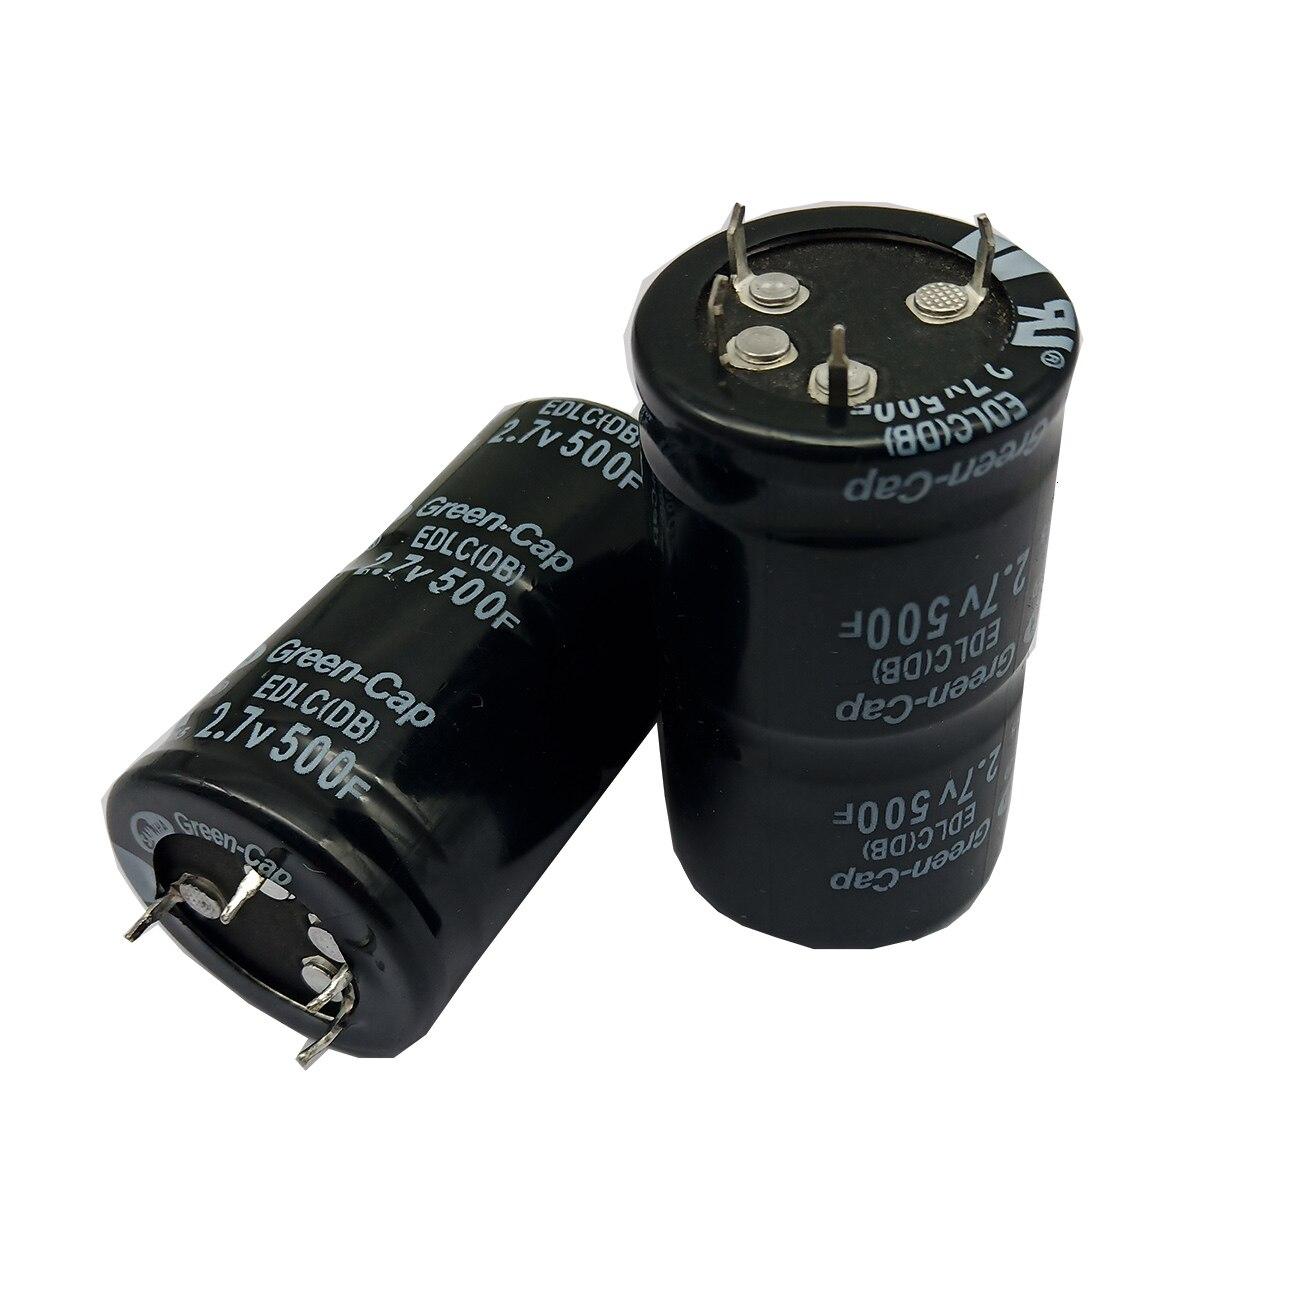 1 шт. Farad конденсатор 2,7 в 500F 35*60 мм Суперконденсатор капель автомобильный конденсатор через универсальное отверстие|Конденсаторы|   | АлиЭкспресс